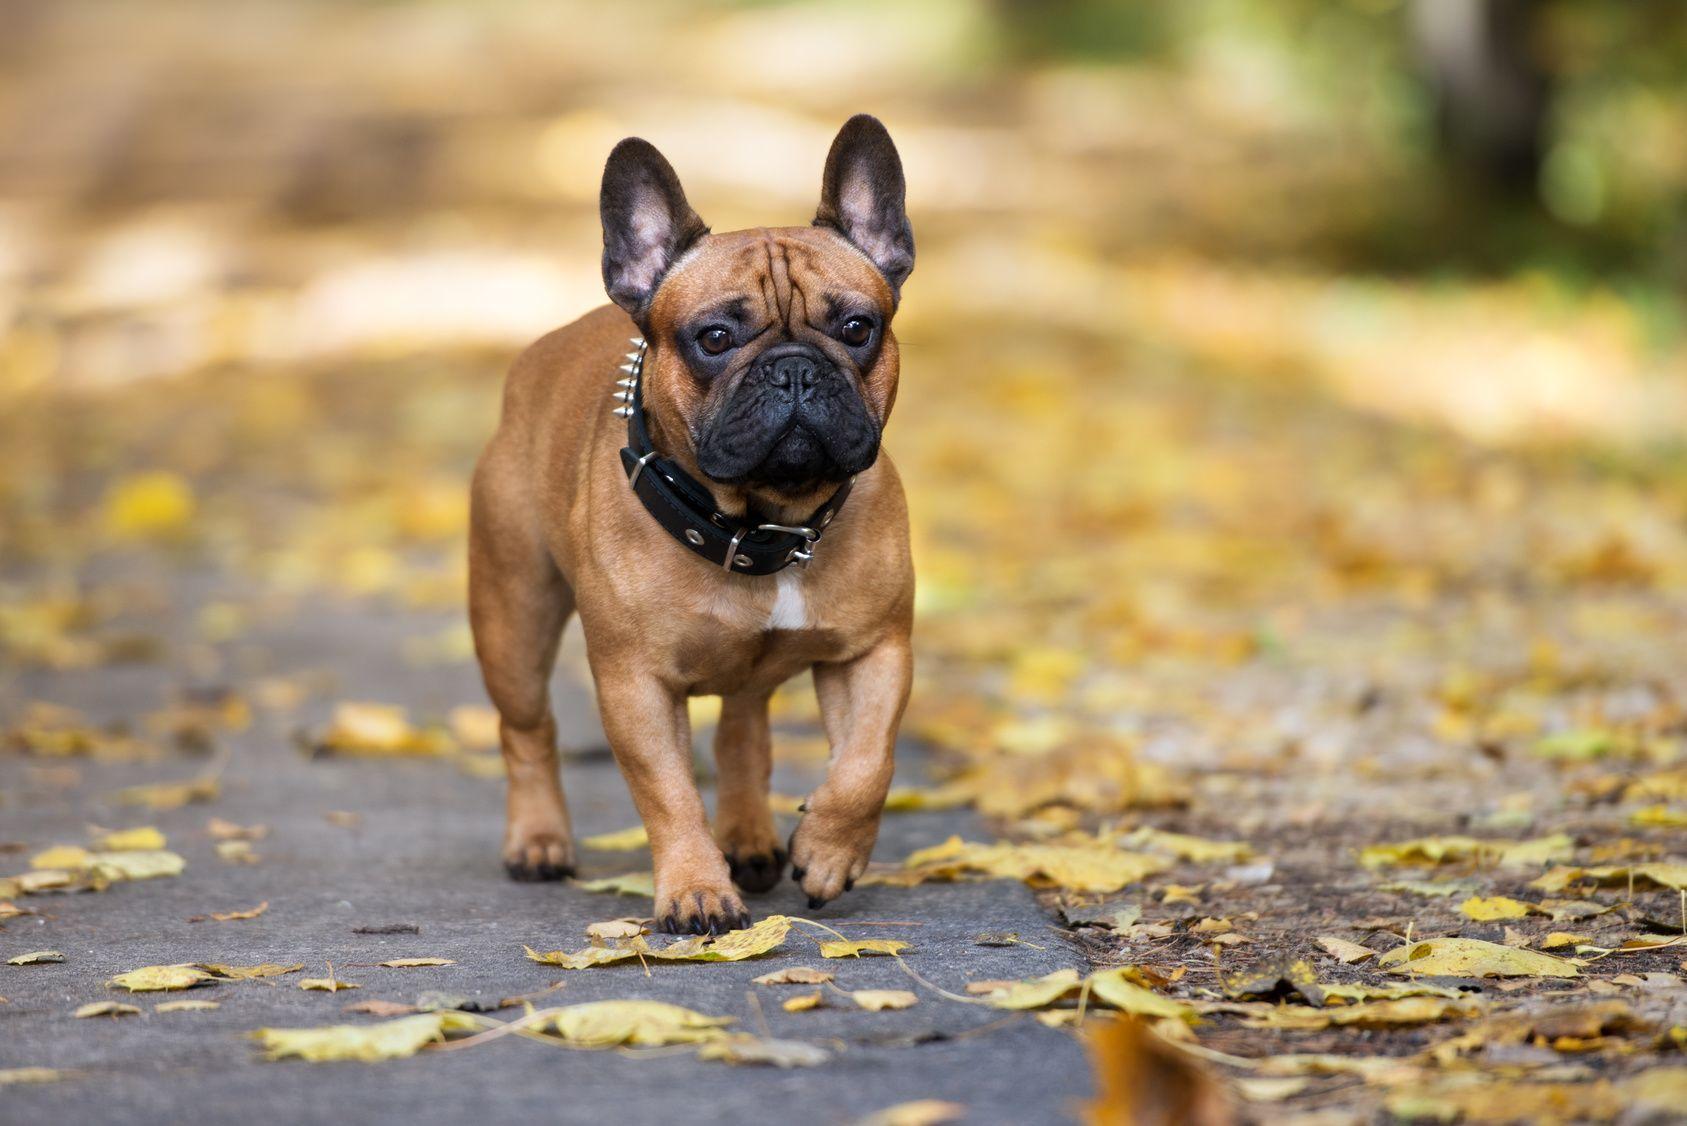 Franzosische Bulldogge Charakter Haltung Pflege Zooplus Franzosische Bulldogge Bulldogge Franzosische Bulldogge Charakter